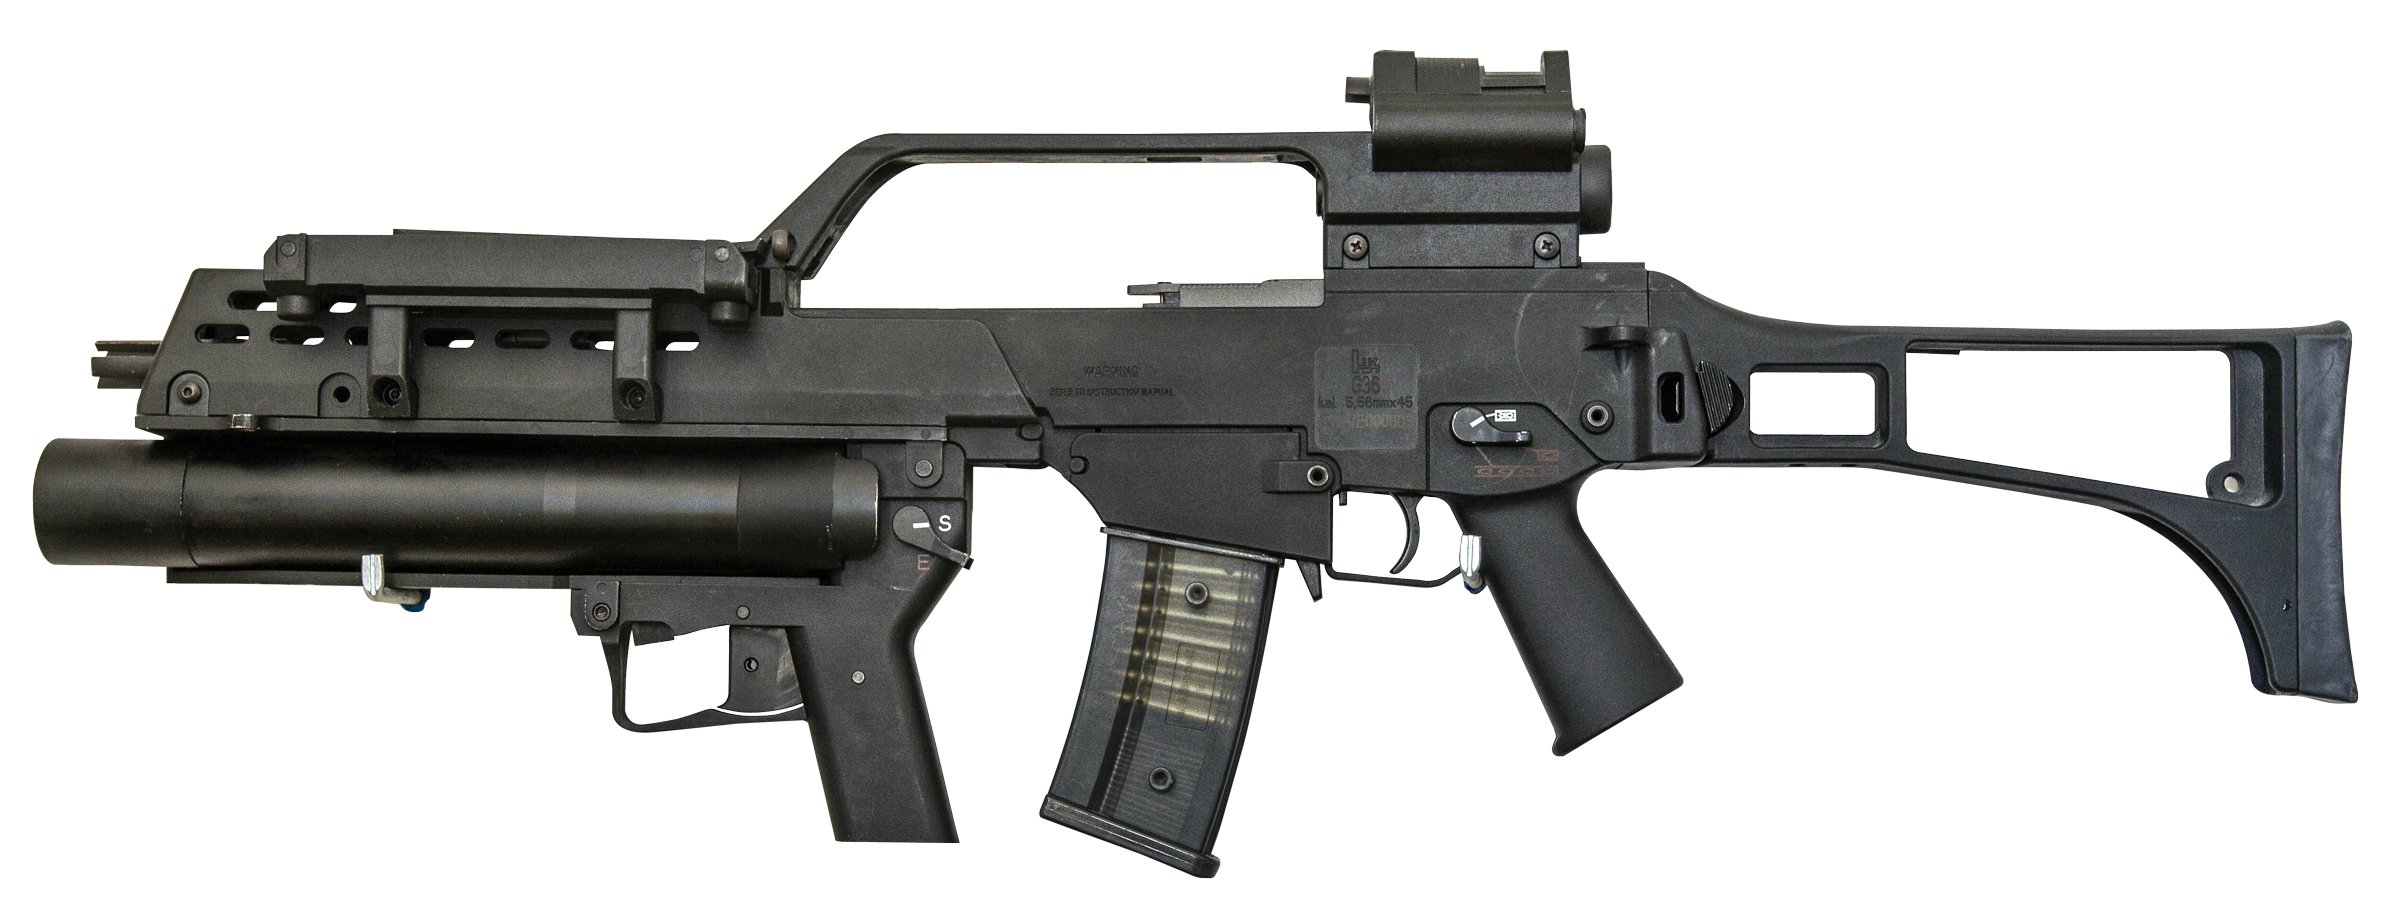 Gun PNG - 16234